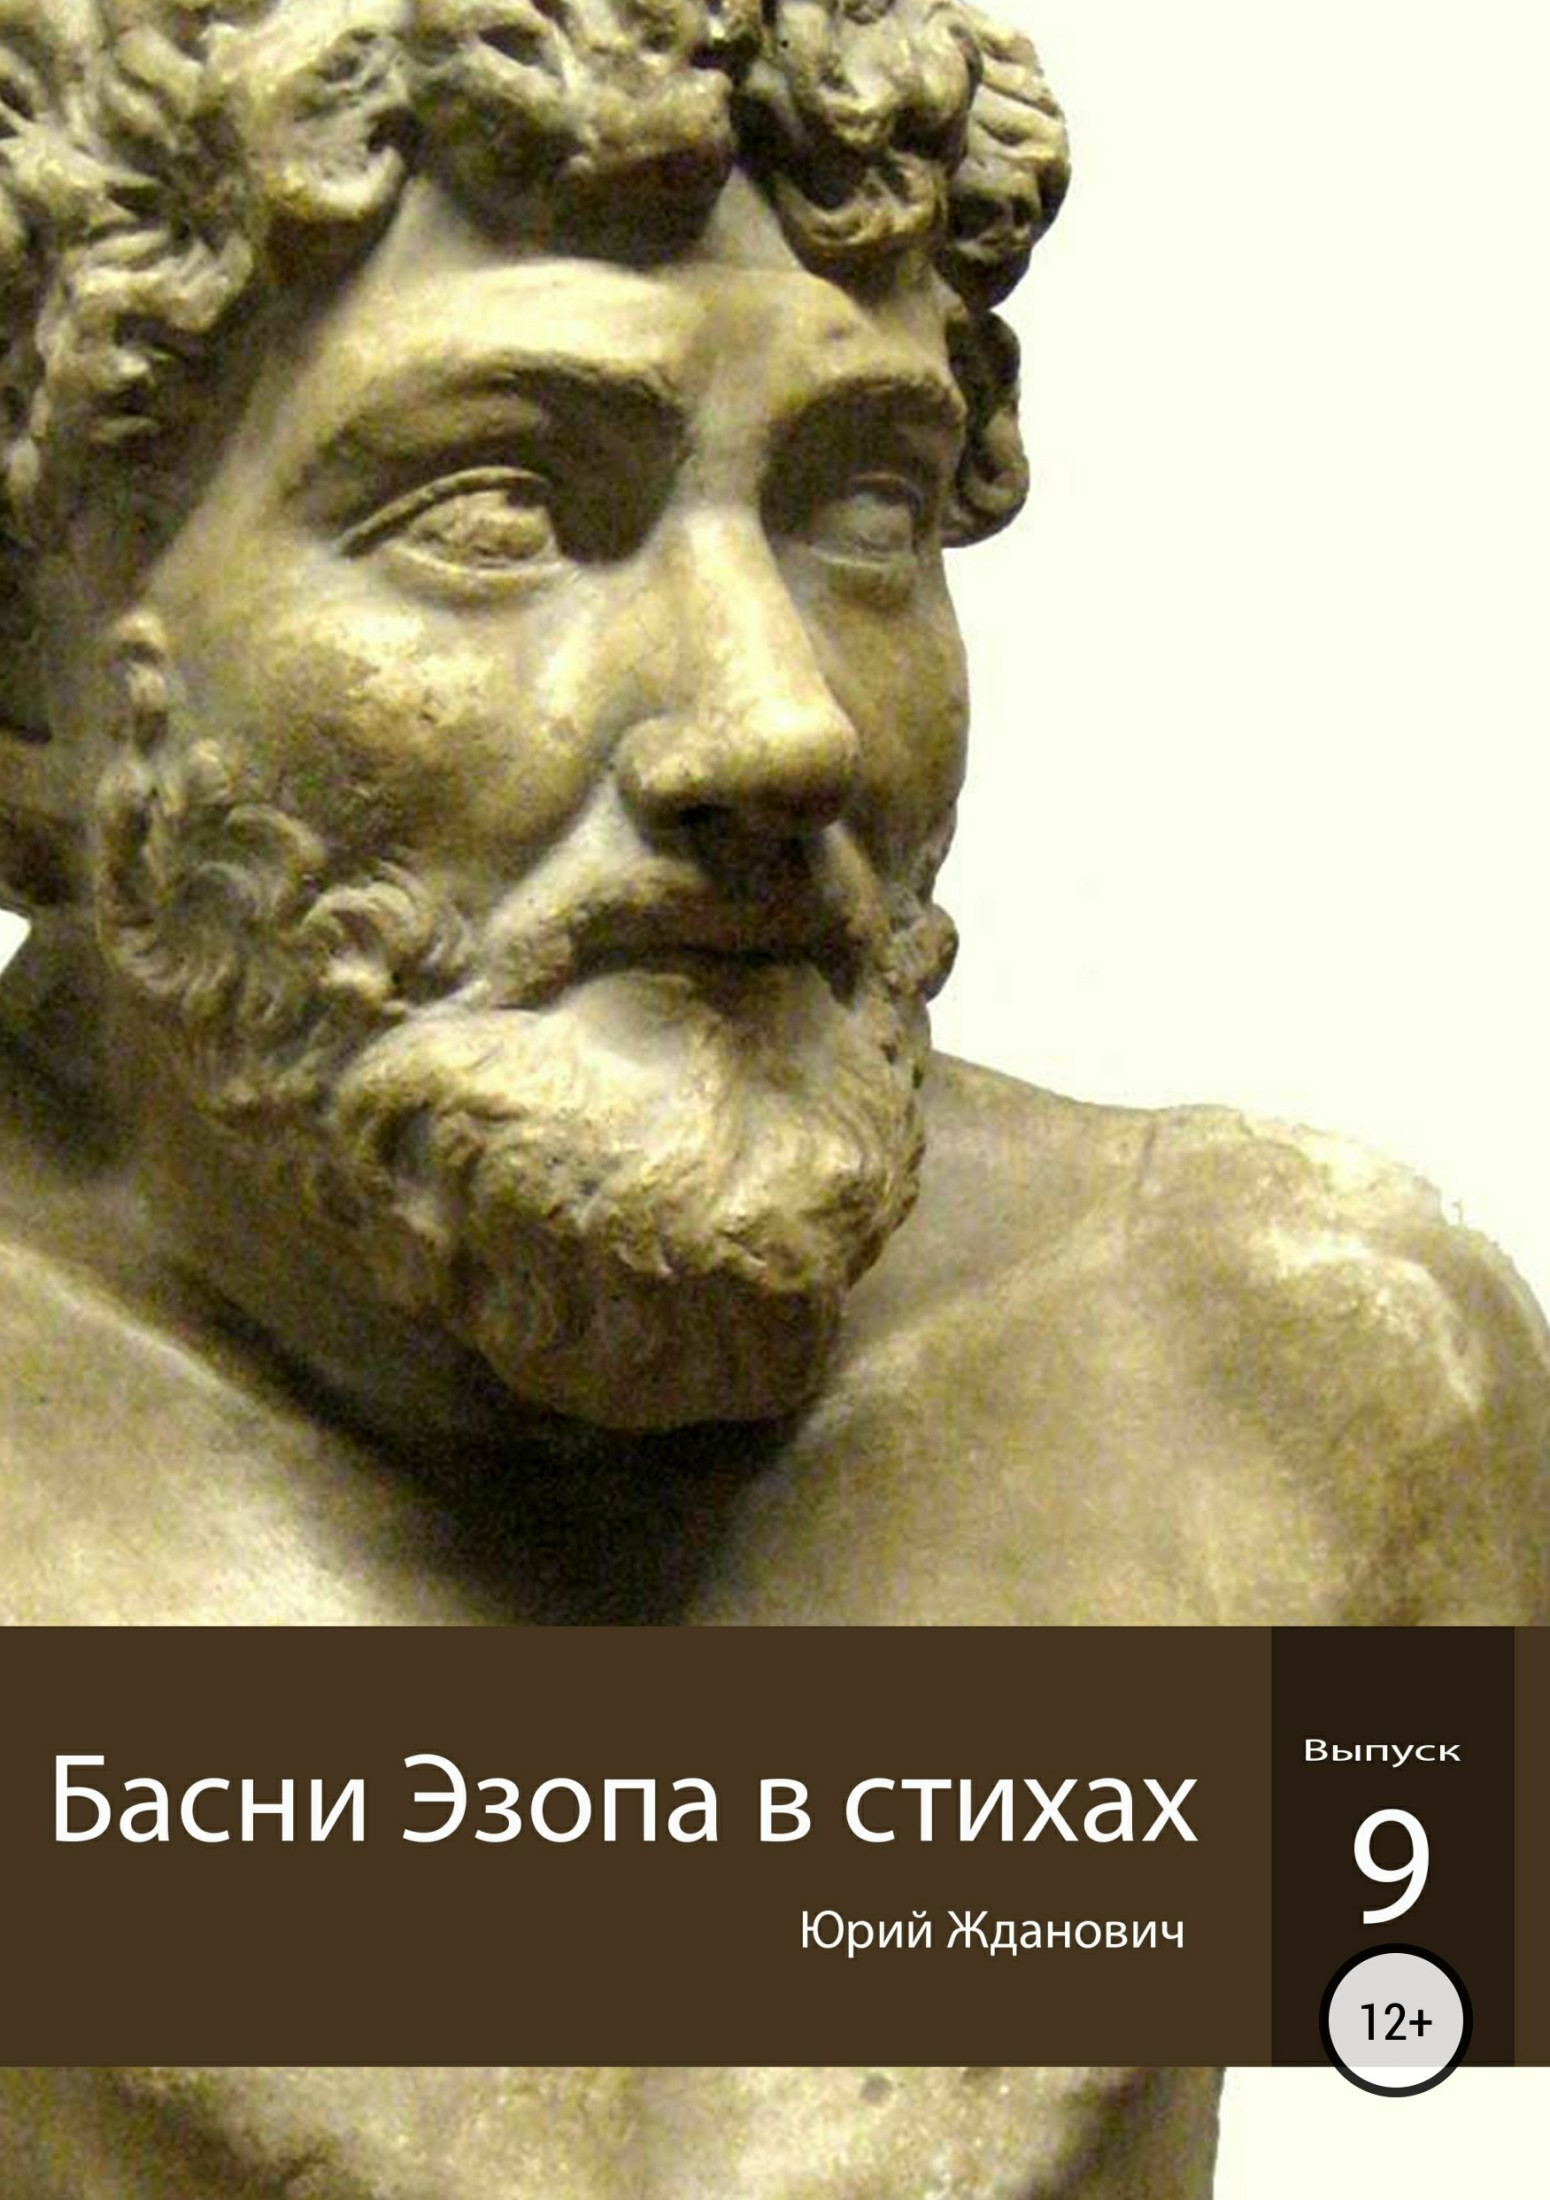 Юрий Михайлович Жданович Басни Эзопа в стихах. Выпуск 9 мастер класс басни с моралью